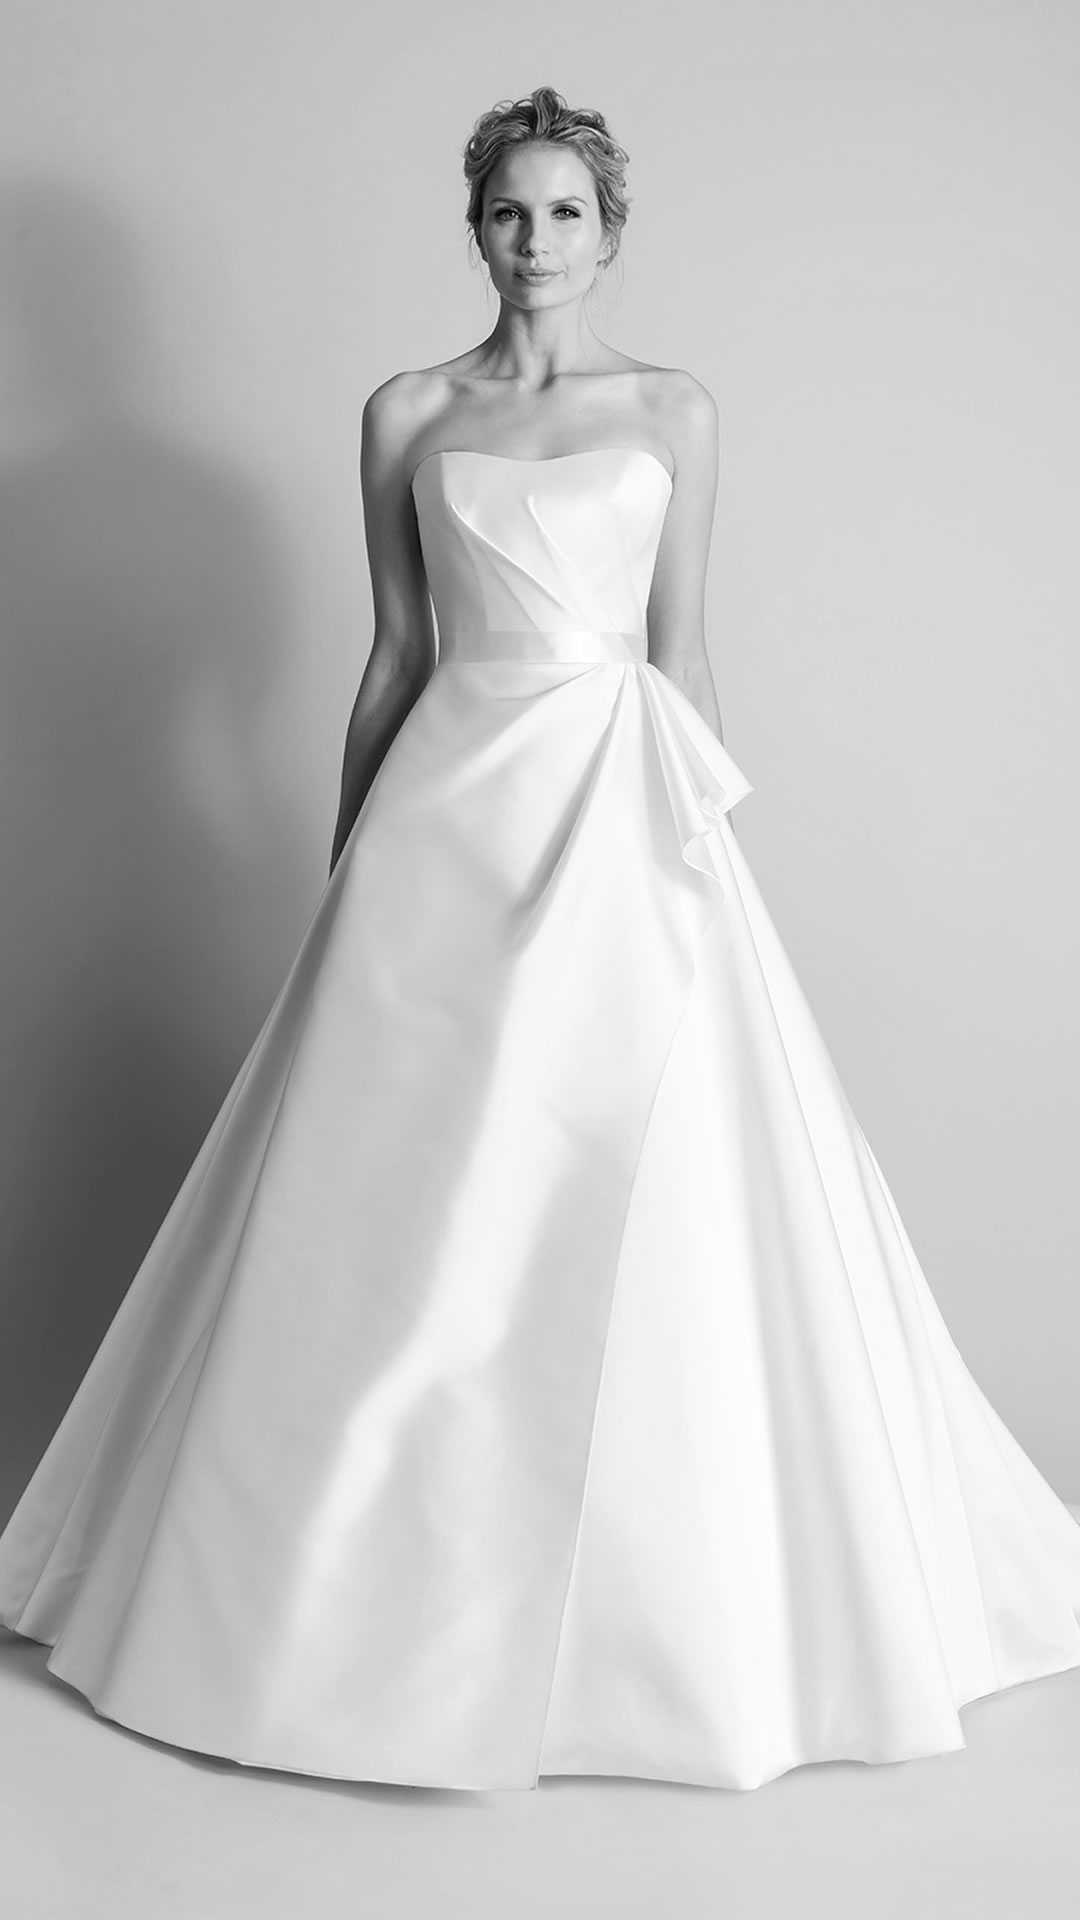 Suzanne Neville Wedding Dresses | Stockists St Albans Hertfordshire